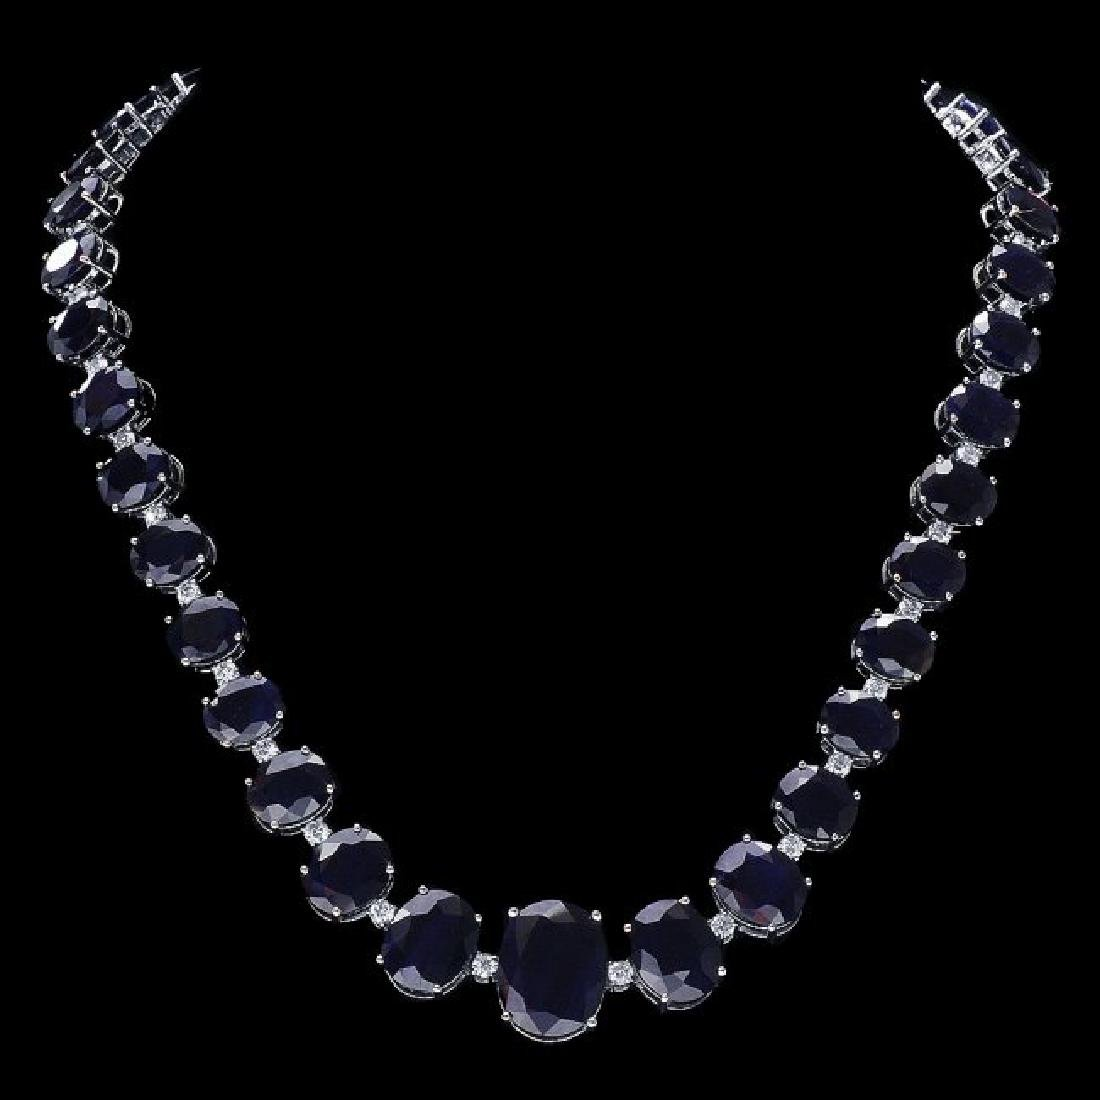 14k Gold 143ct Sapphire 4ct Diamond Necklace